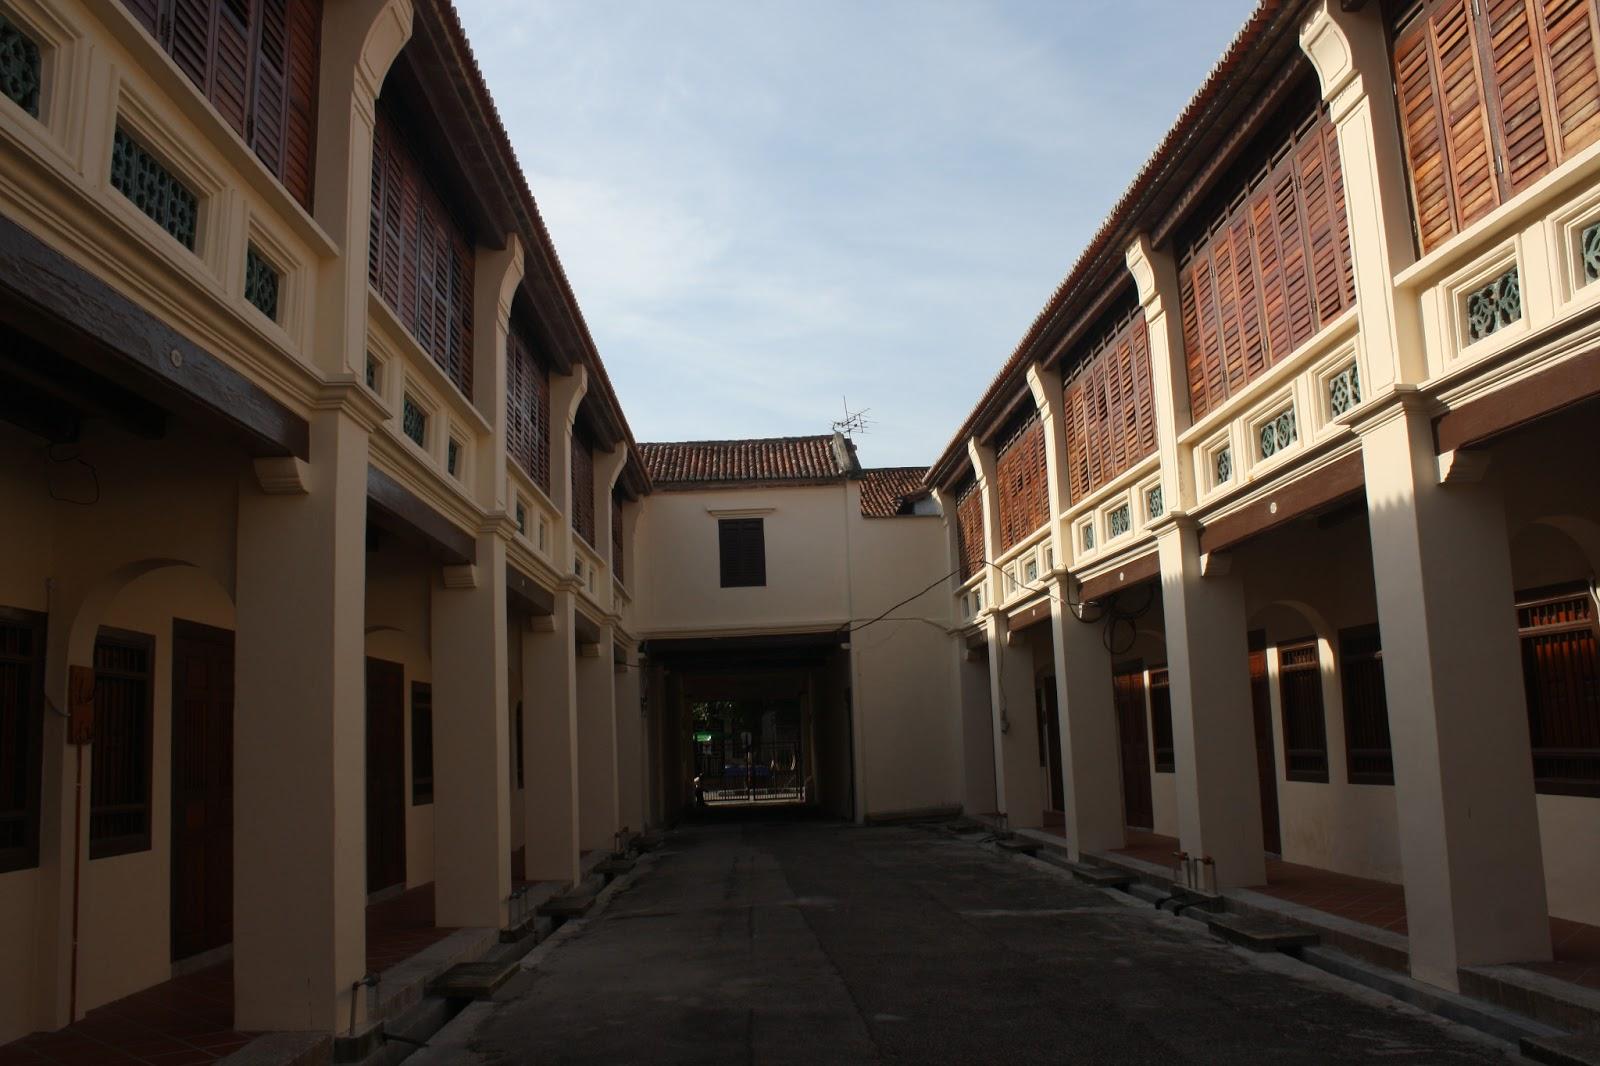 Jalanjalan khoo kongsi penang for Terrace 9 penang